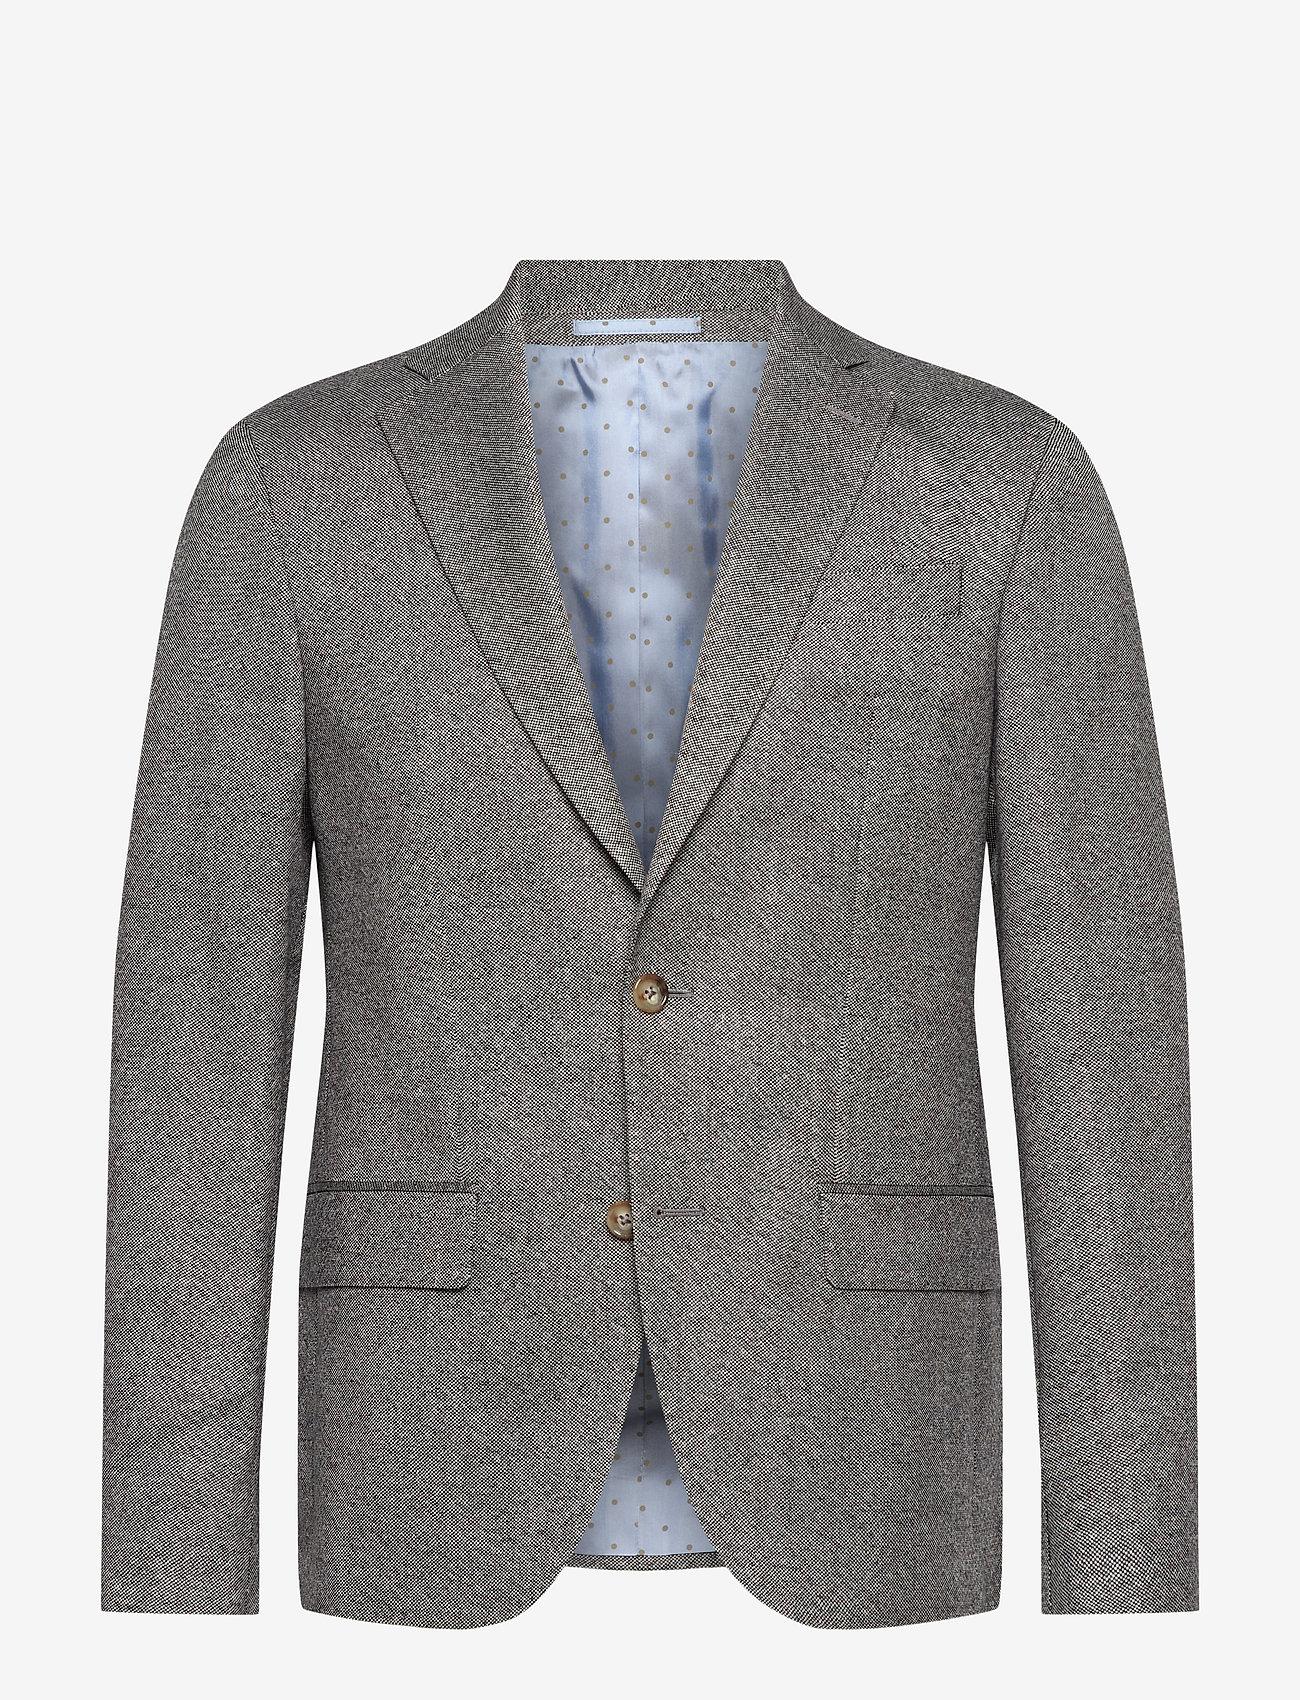 SAND - 6135 Oxford - Star Napoli Normal - blazers met enkele rij knopen - grey - 0